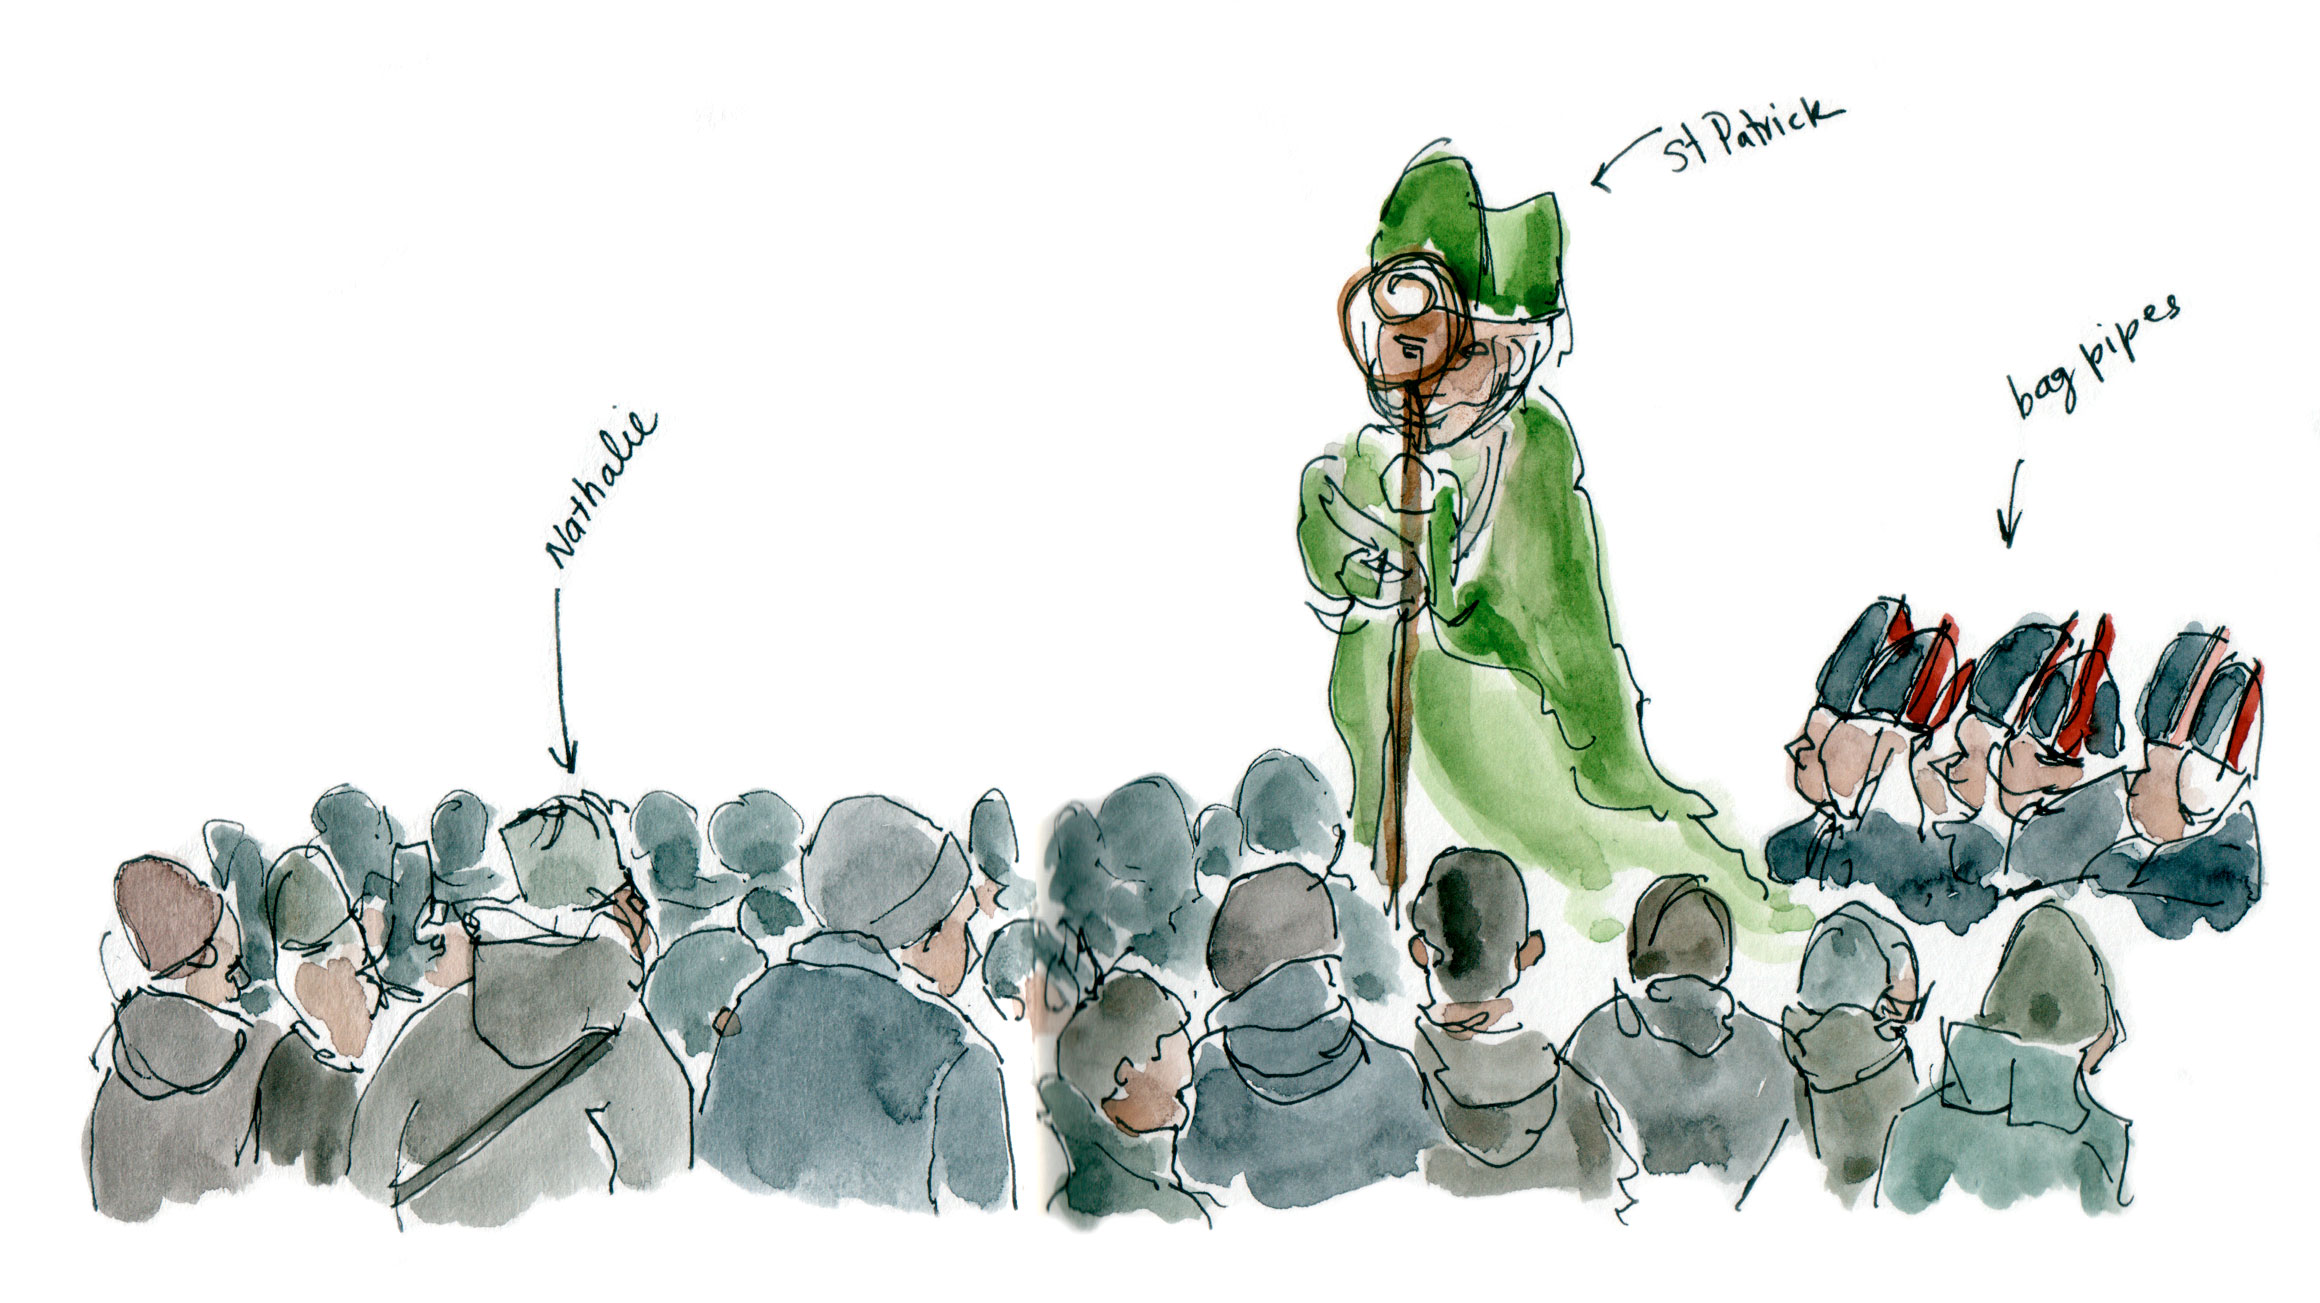 St Patrick's Parade start